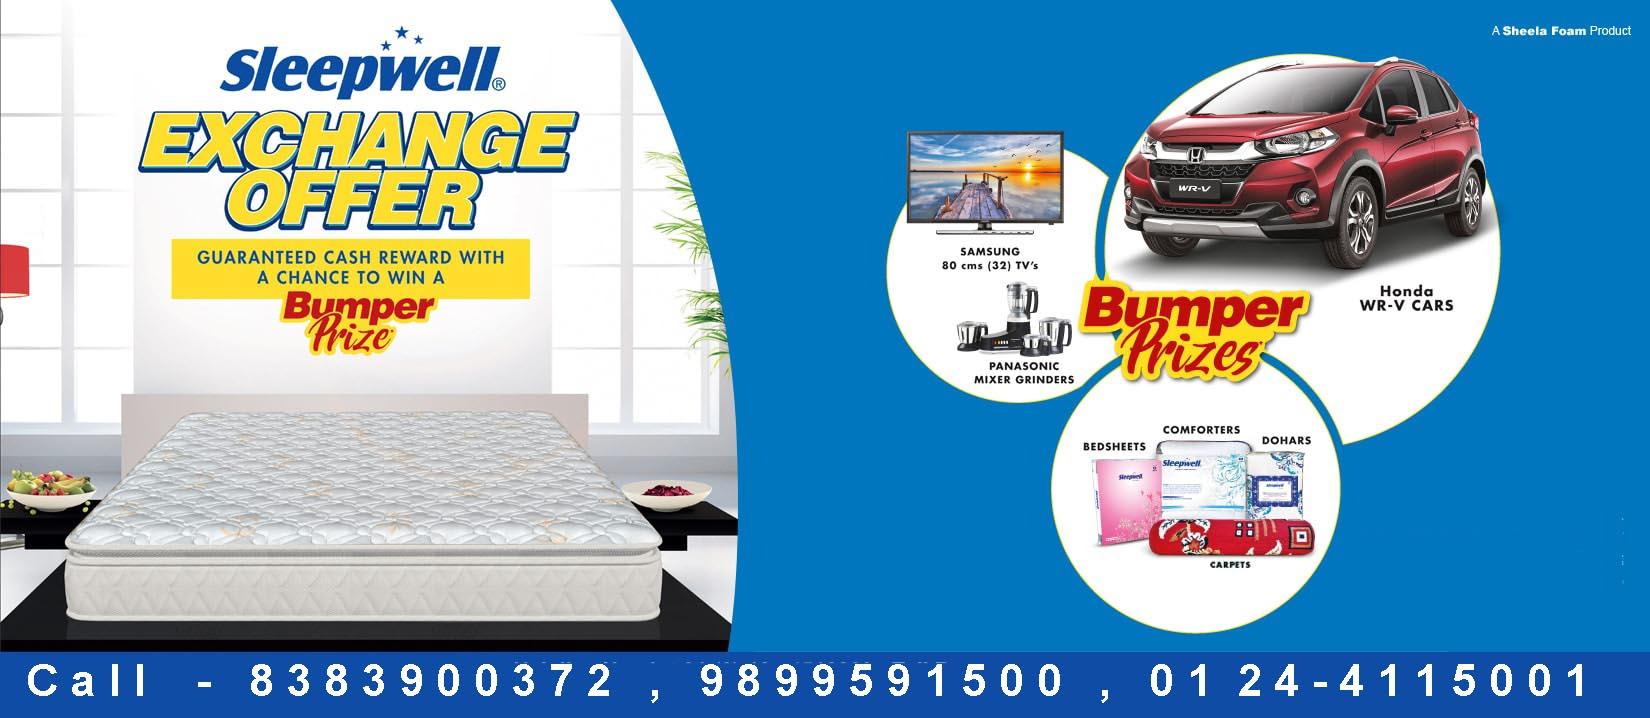 Sleepwell Kwality Mattresses Sleepwell Mattress Exchange Offer In Gurgaon And Delhi